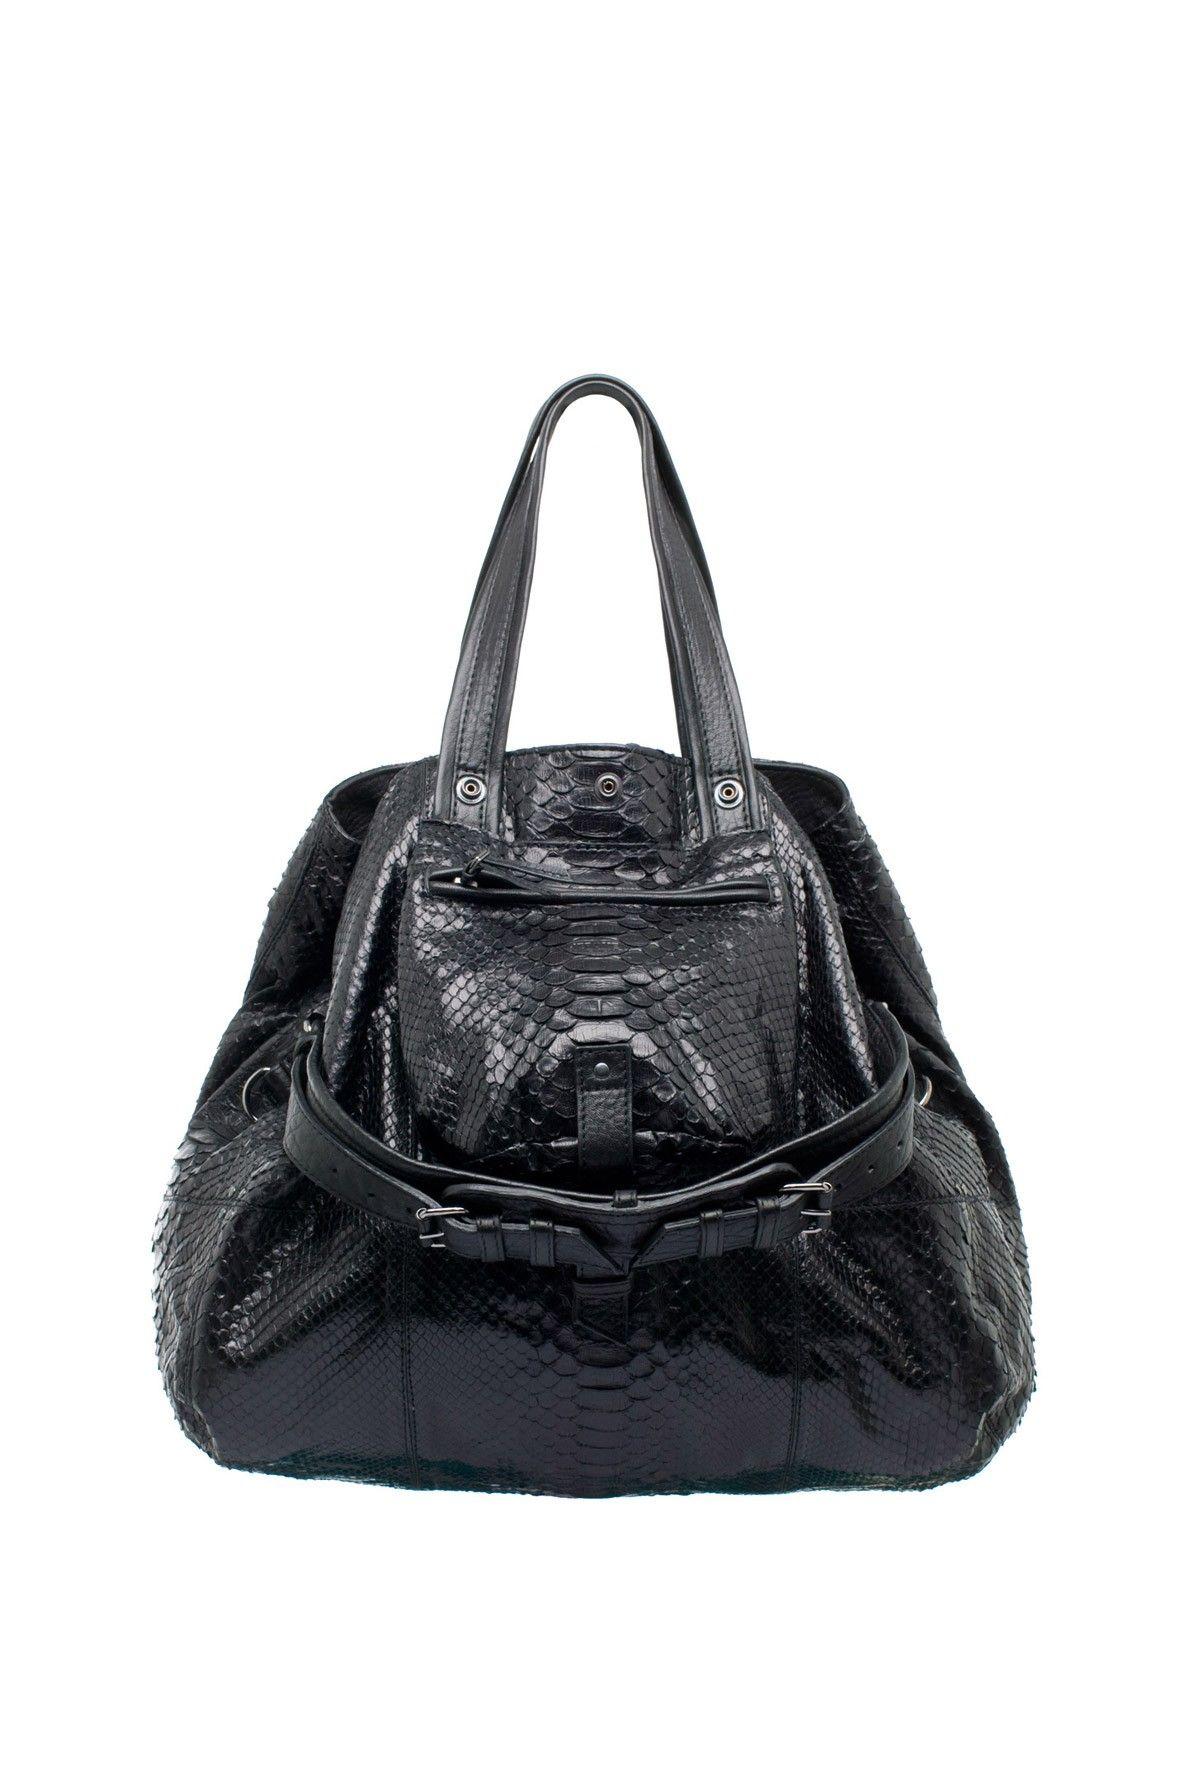 b792270601 Billy M Python et Veau Noir - JEROME DREYFUSS | Fashion | Jerome ...